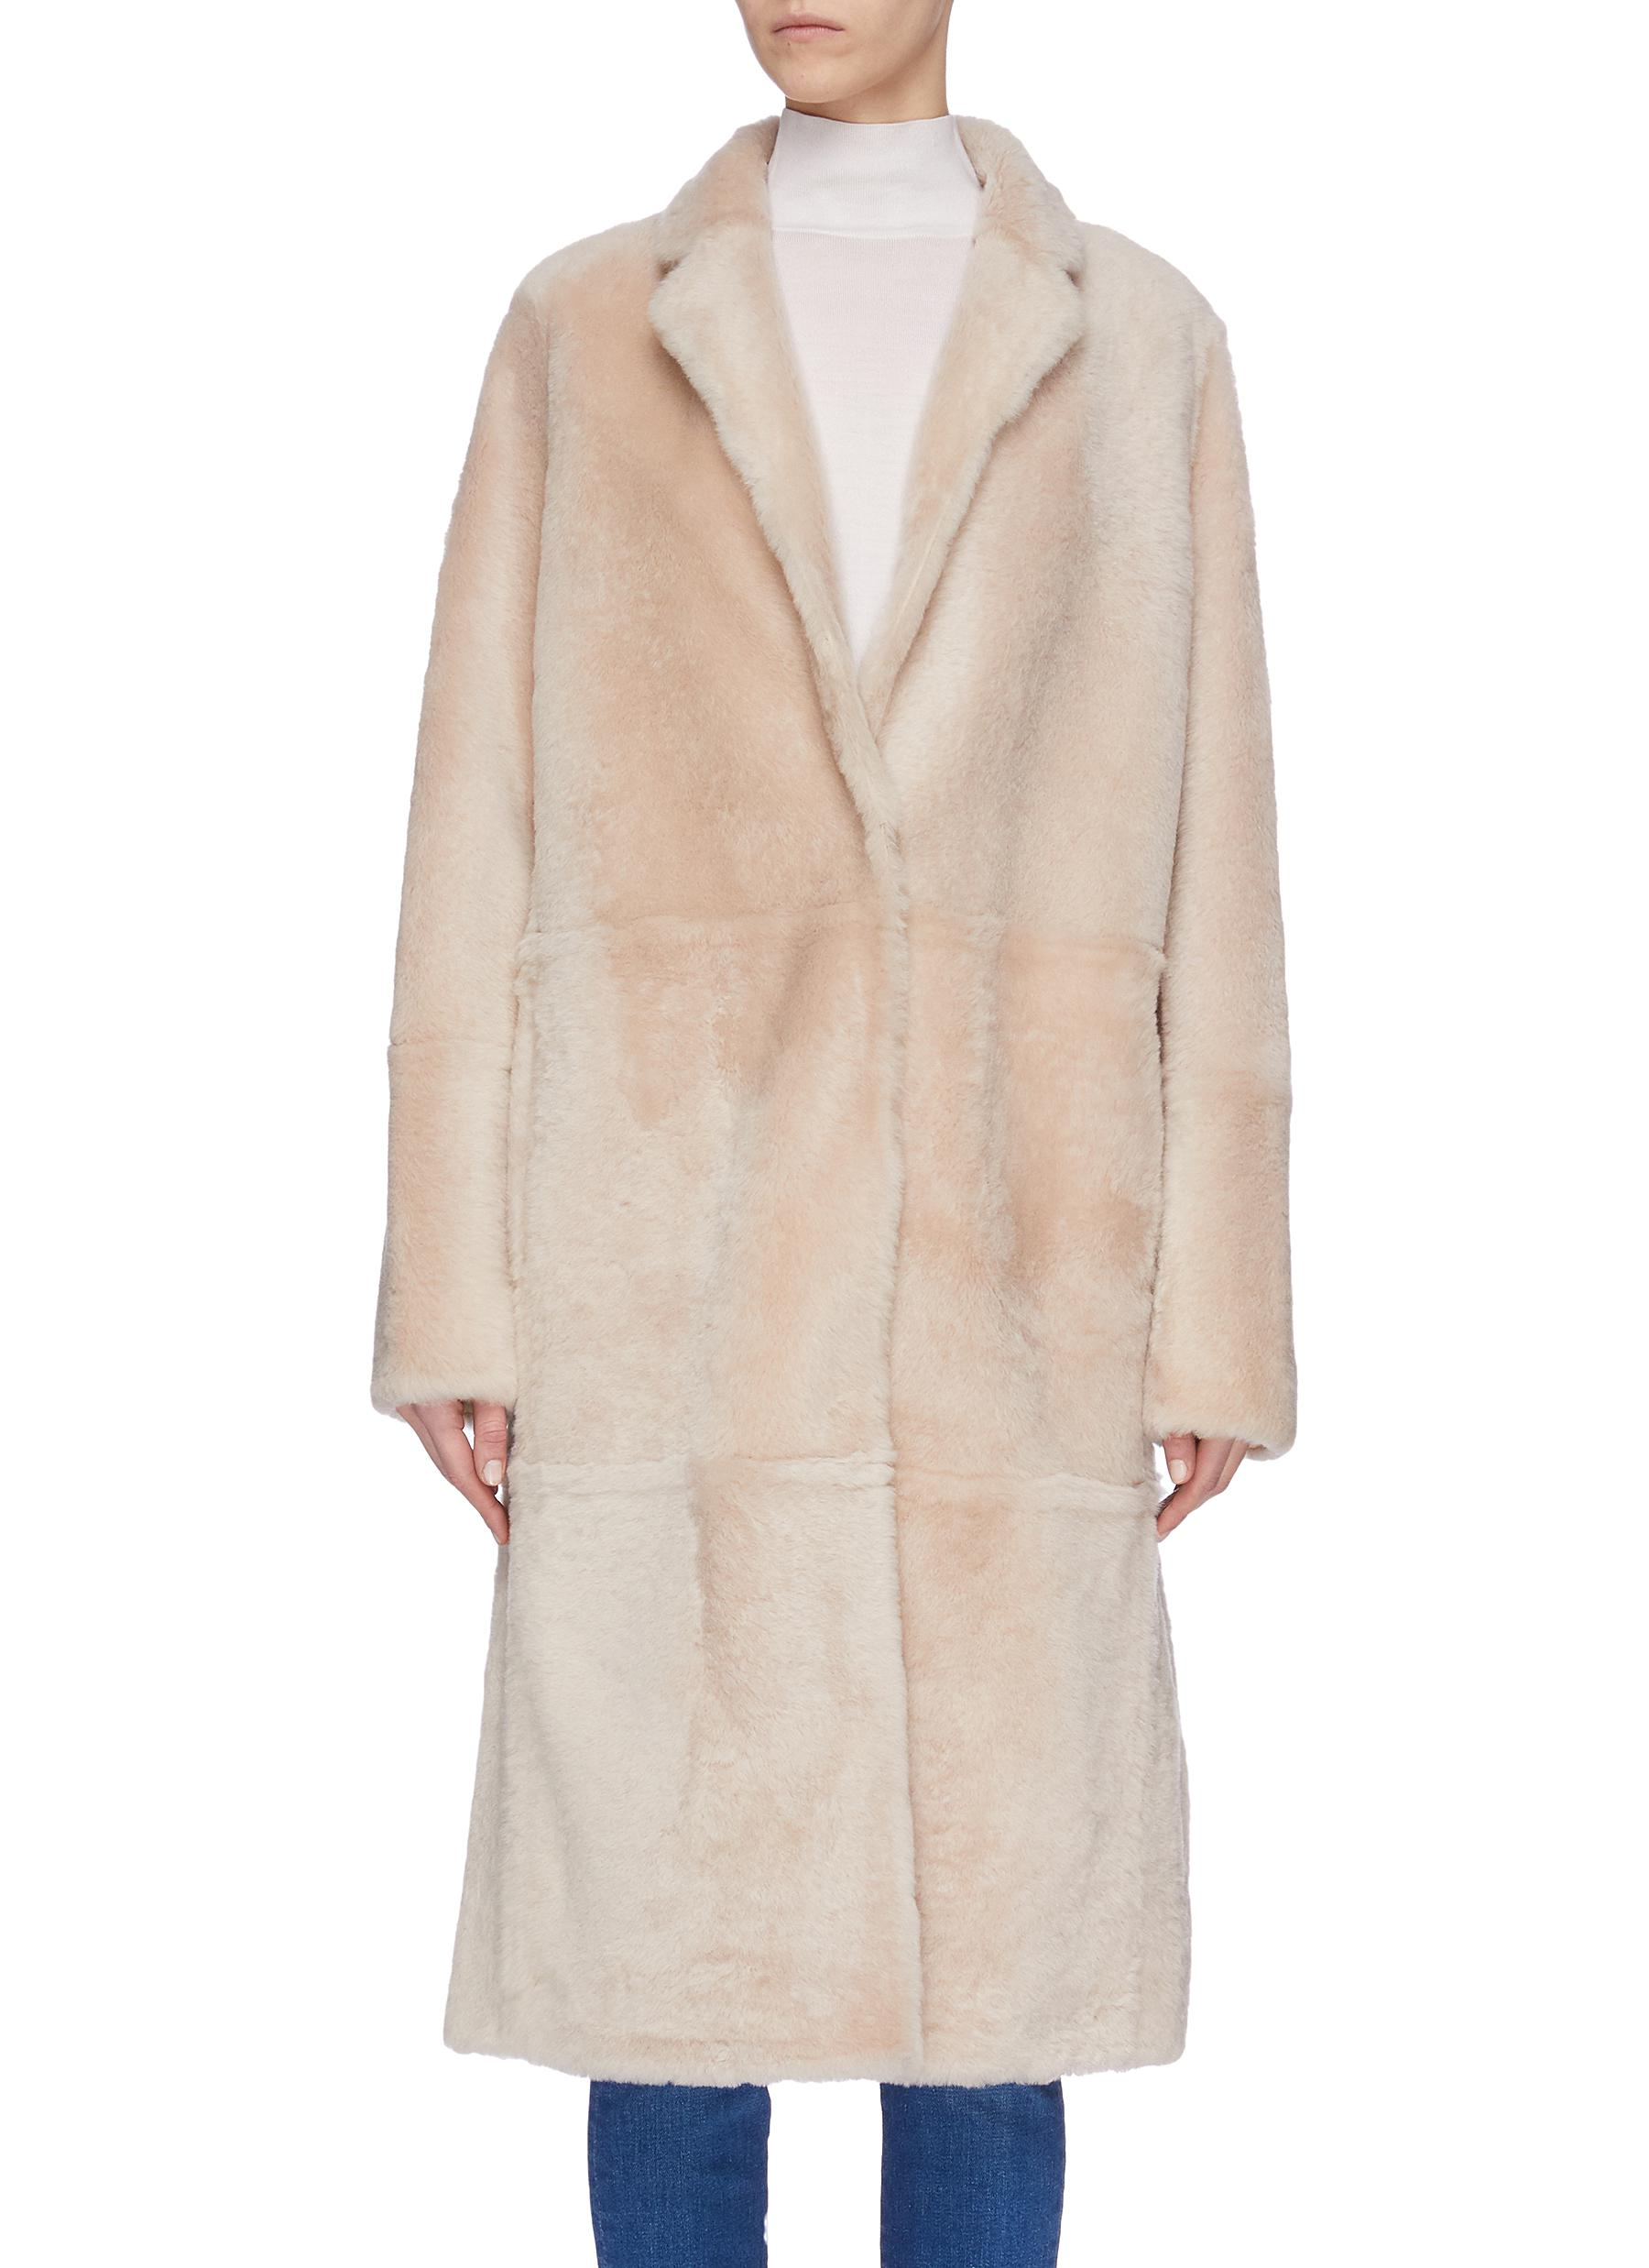 shop Yves Salomon 'Lacon' lambskin leather fur coat online